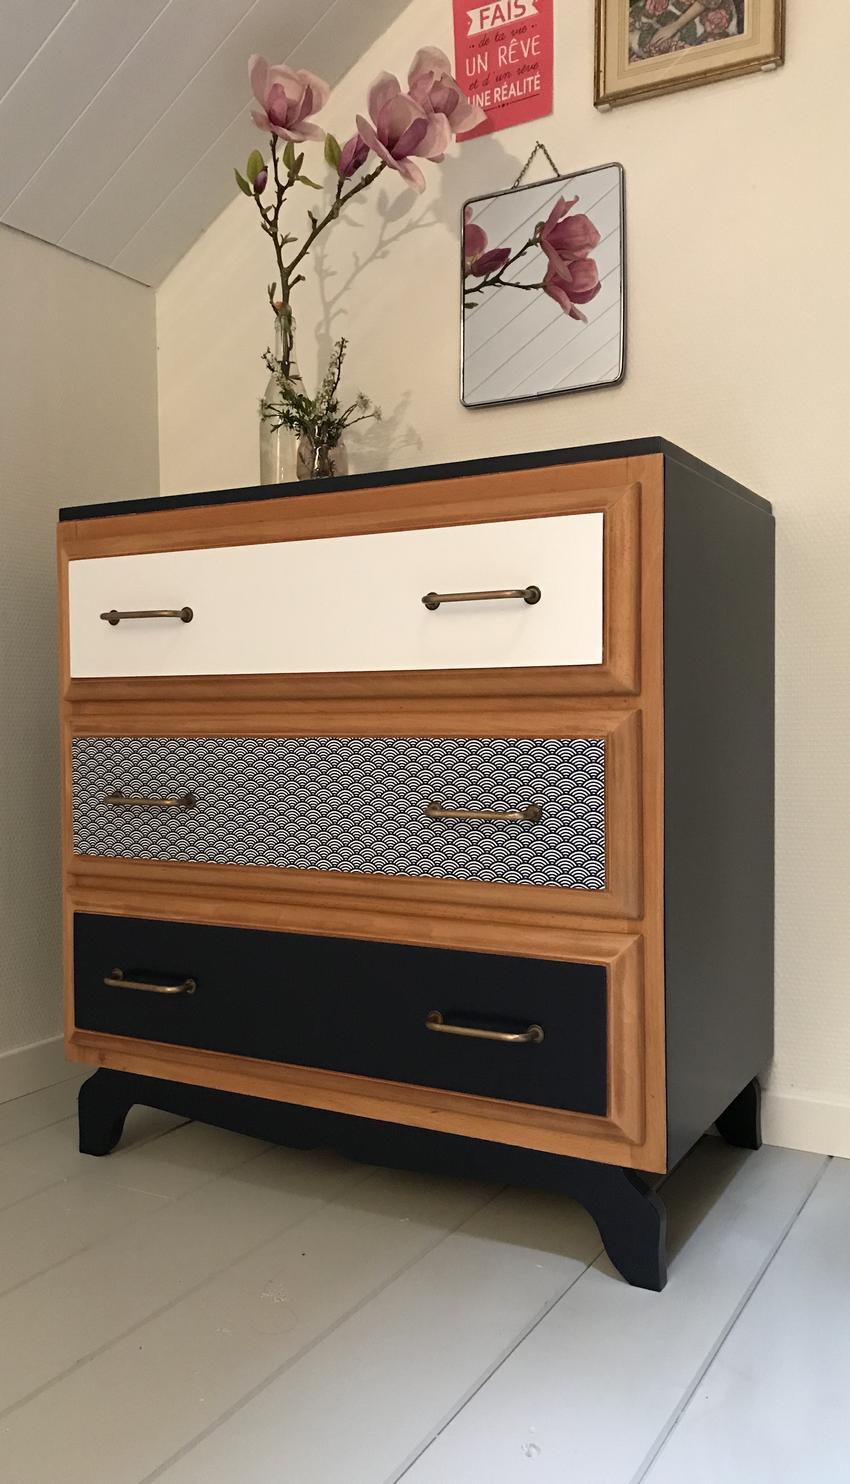 commode vintage louisa relooking de meubles vintage nantes. Black Bedroom Furniture Sets. Home Design Ideas